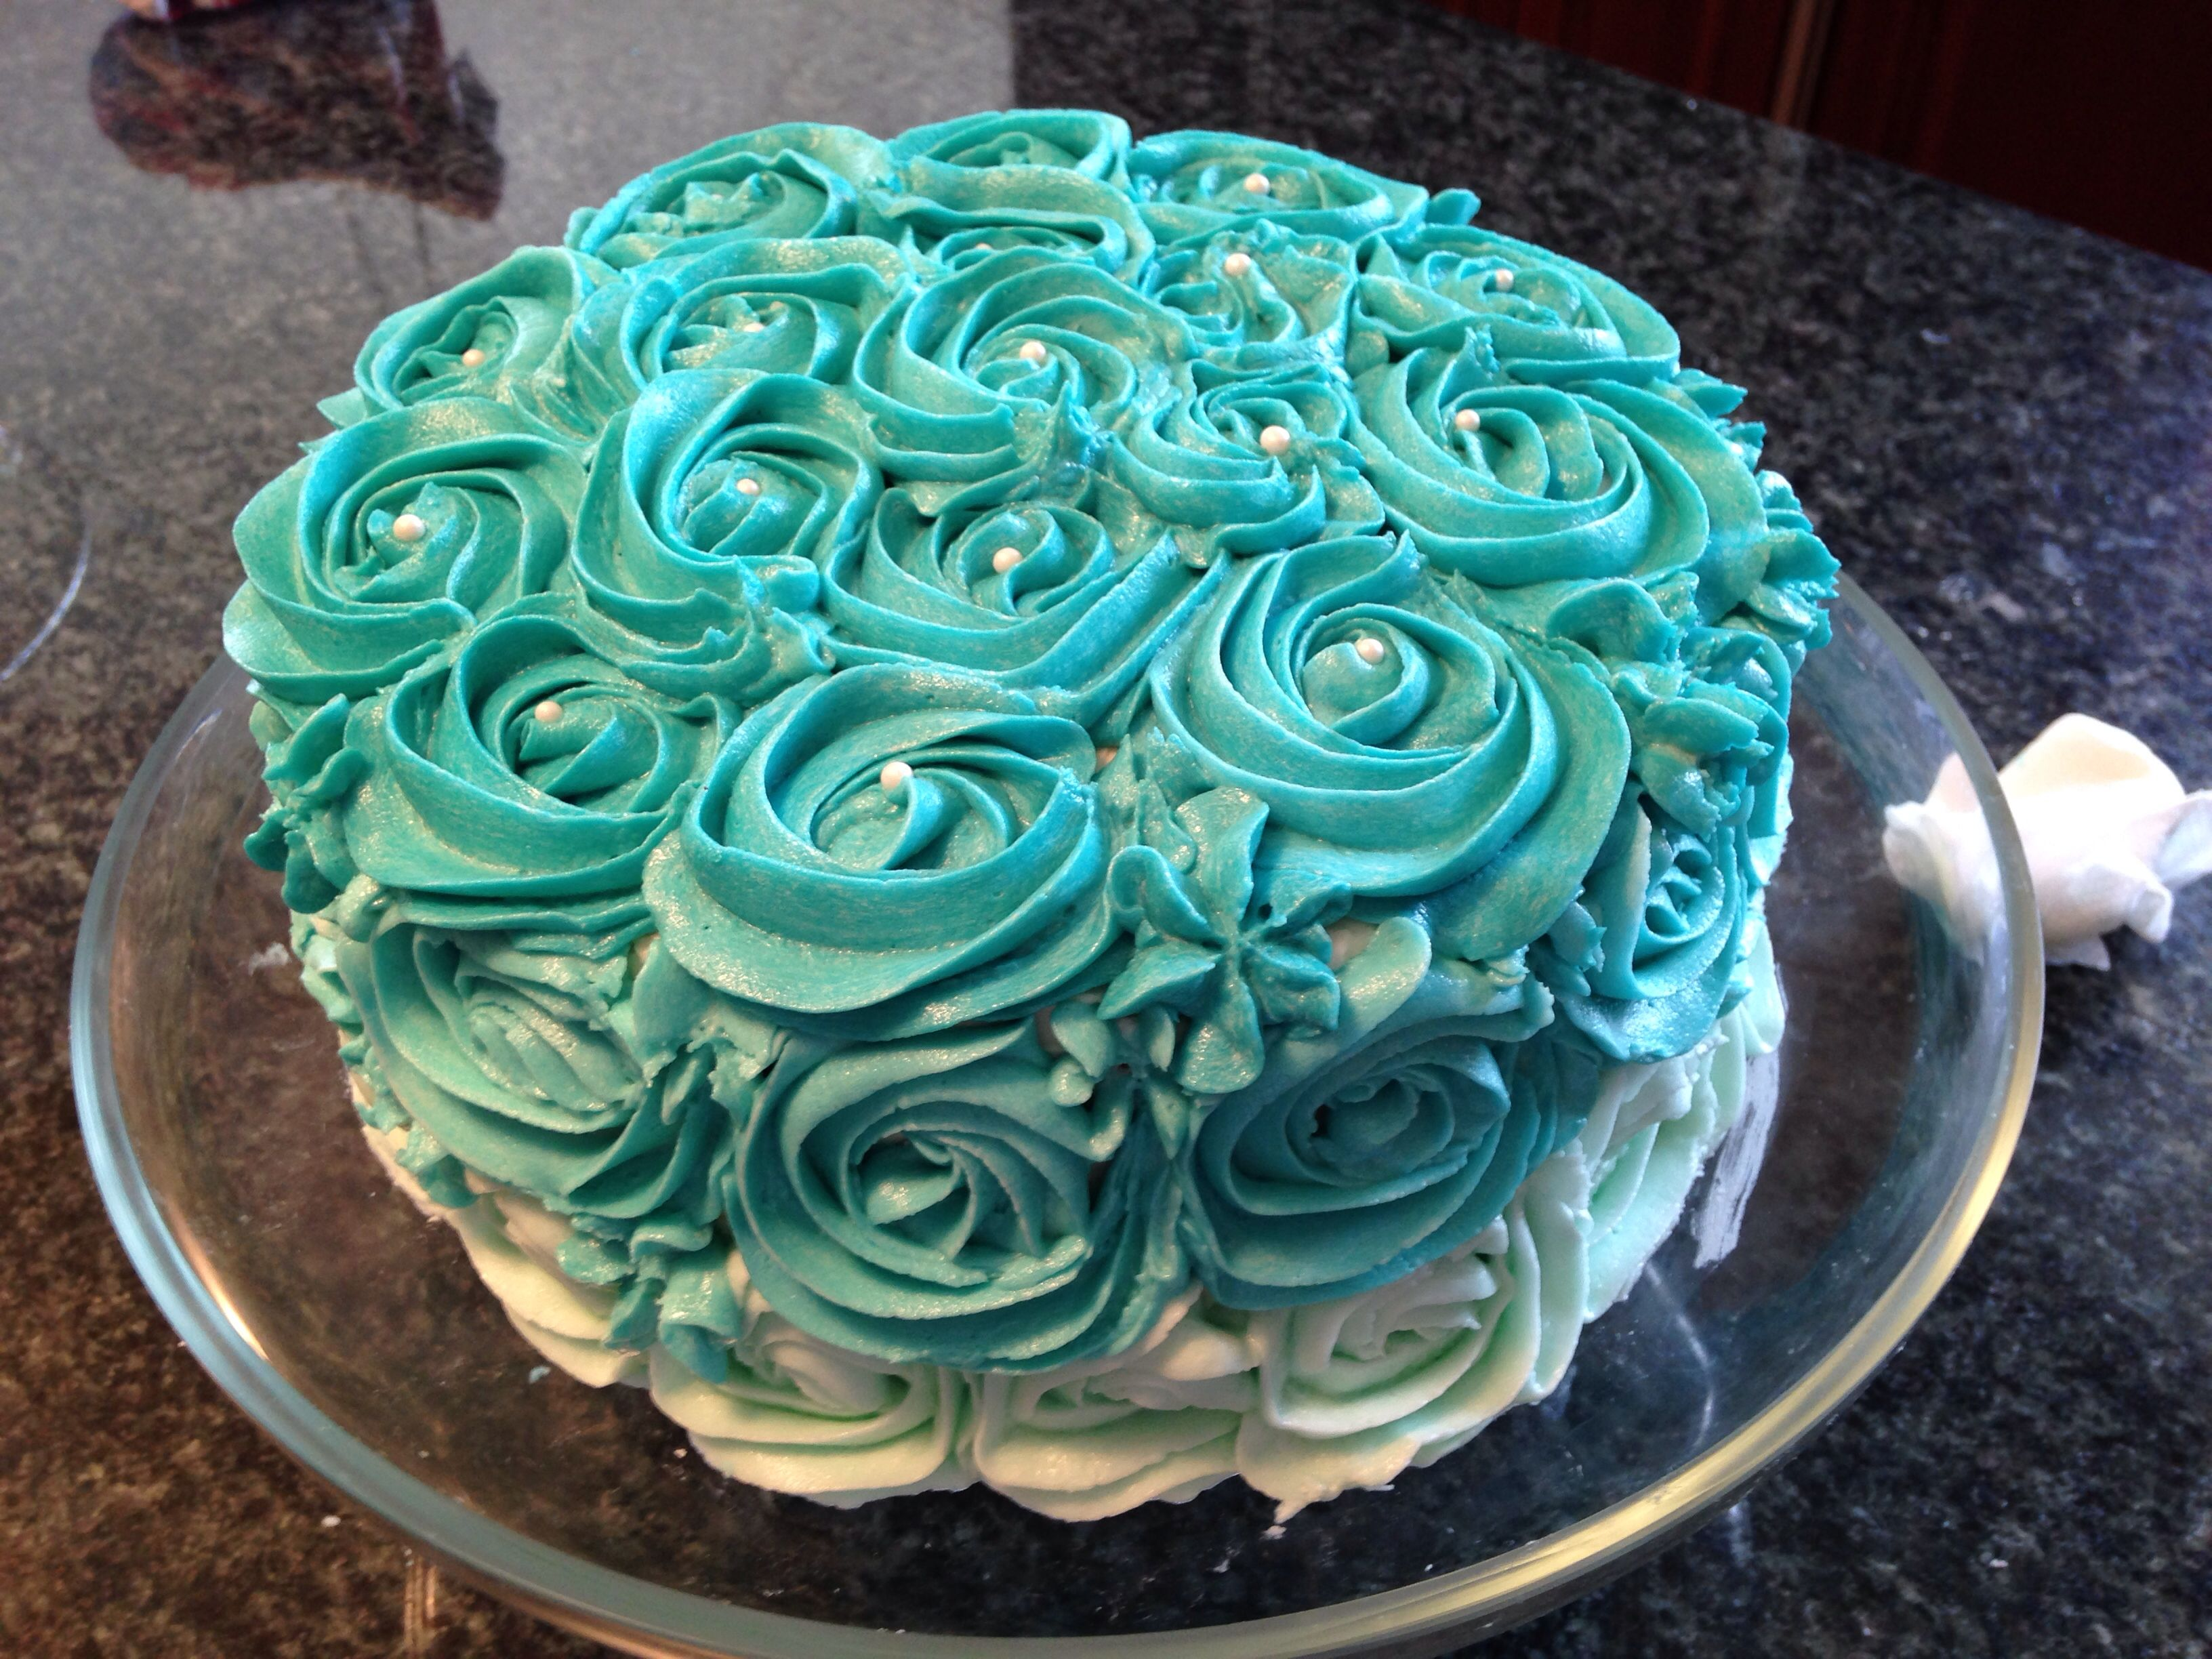 Teal ombre rose cake decoration | Cake decorating, Cake ...